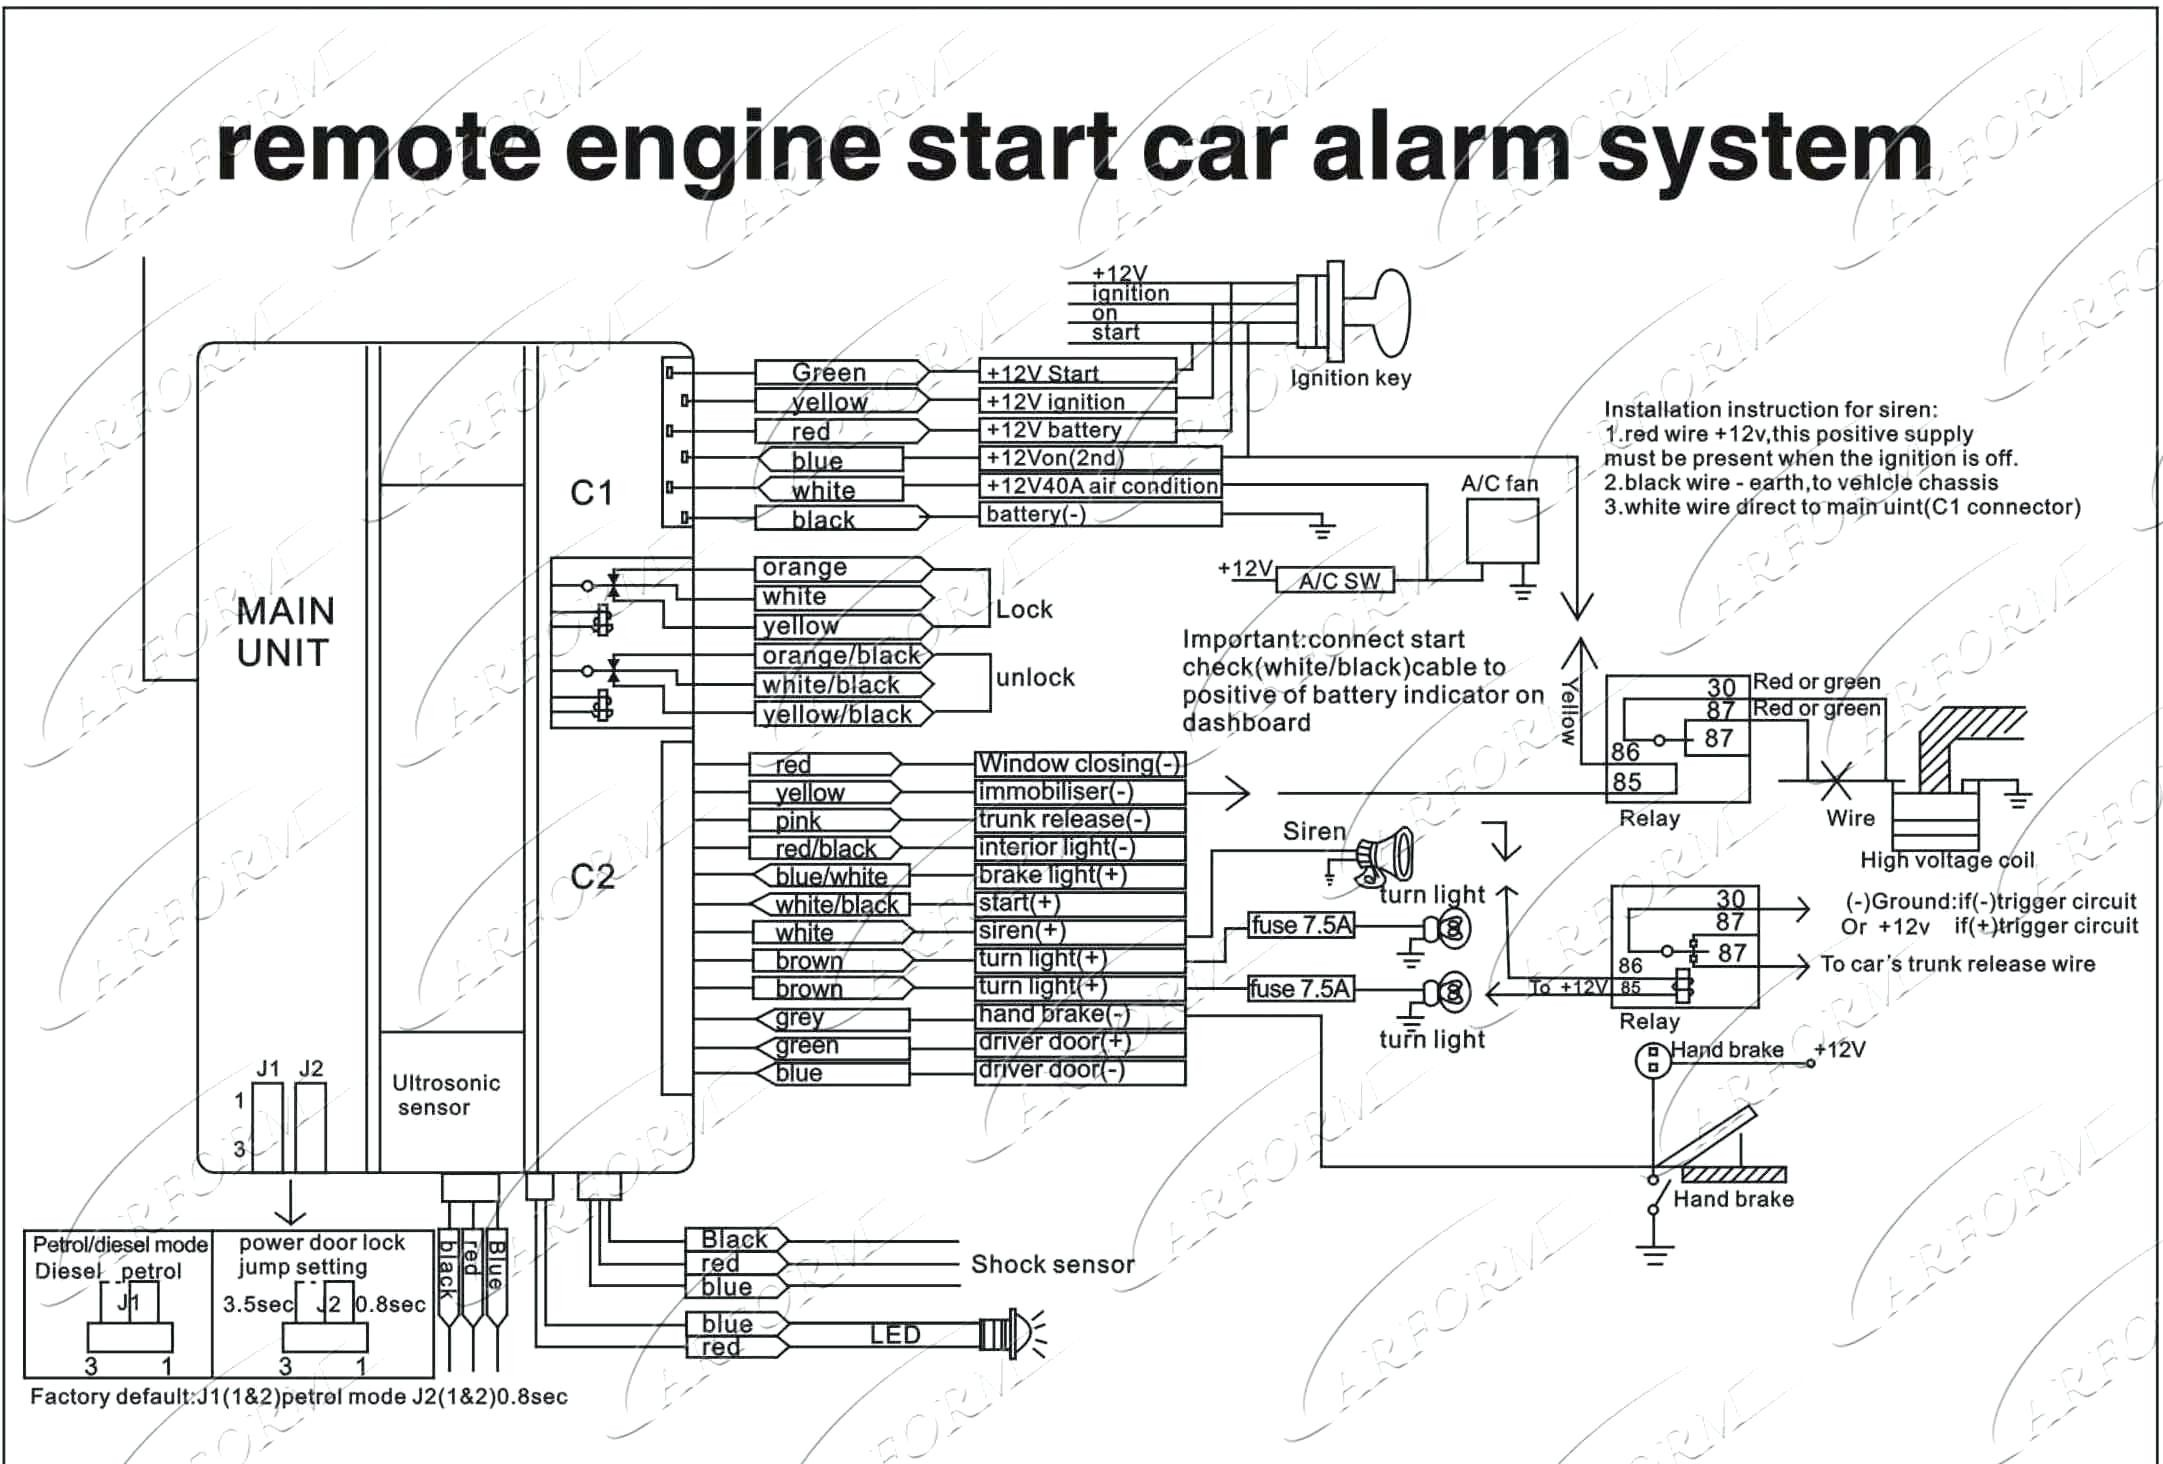 DIAGRAM] Scorpion 1014 Car Alarm Wiring Diagram FULL Version HD Quality Wiring  Diagram - VIRTUALWIRINGCLOSET.LITTLETEO.FRDiagram Database - LITTLETEO